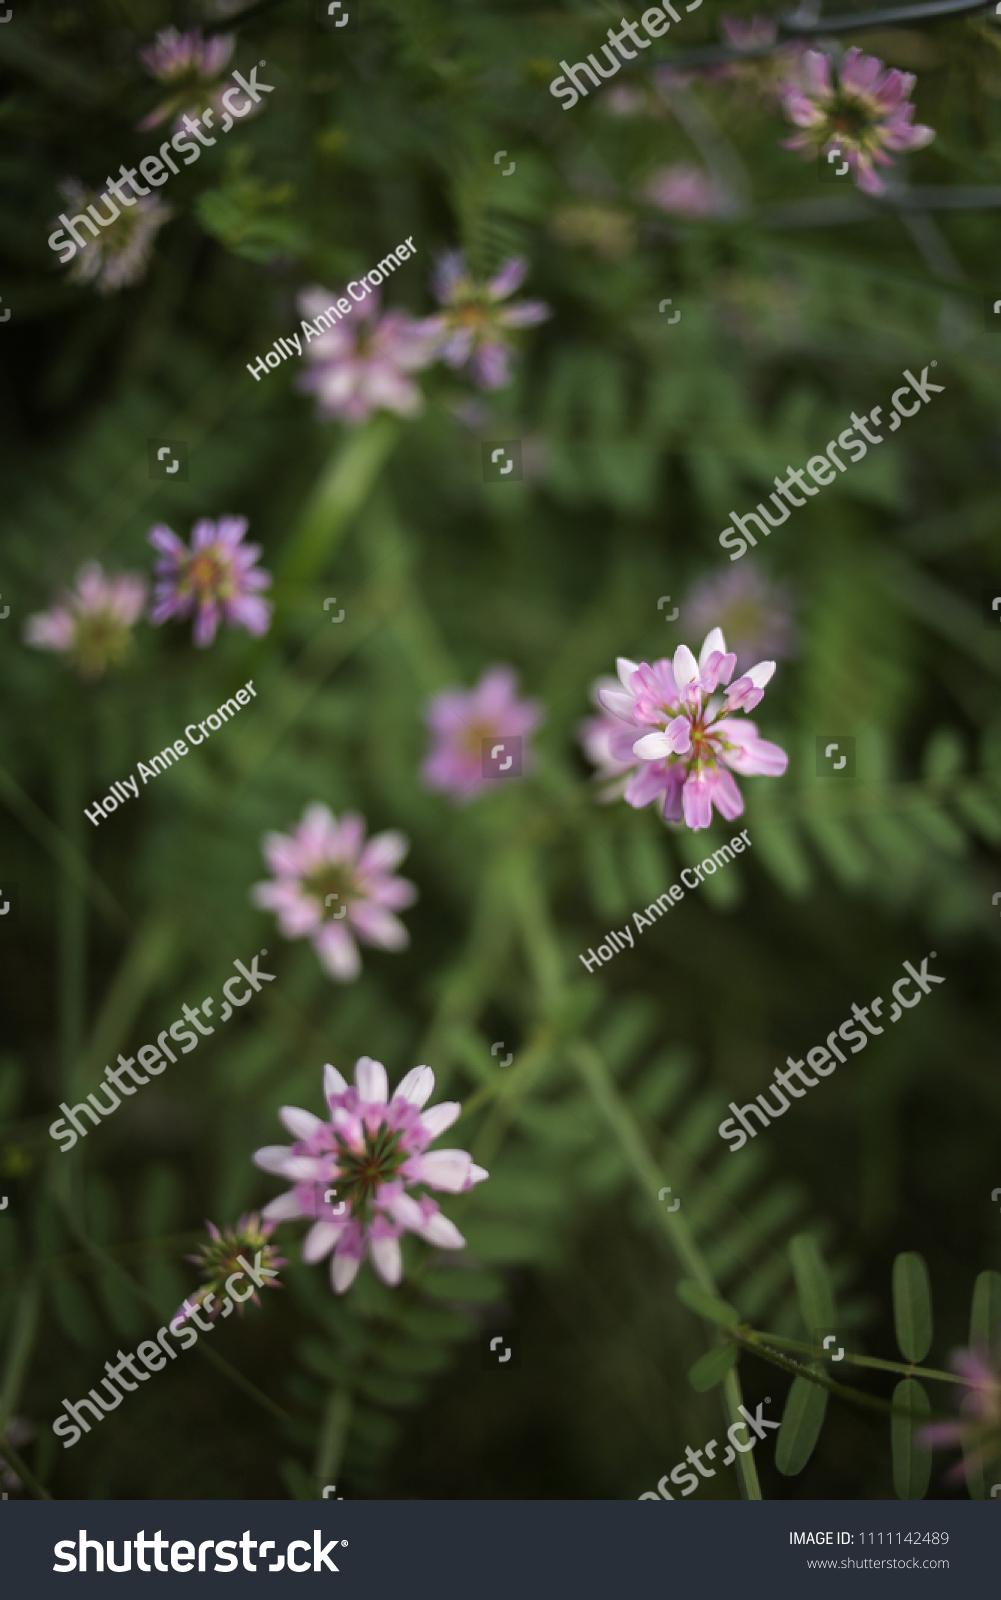 Purple crown vetch crownvetch flower stock photo edit now purple crown vetch crownvetch flower izmirmasajfo